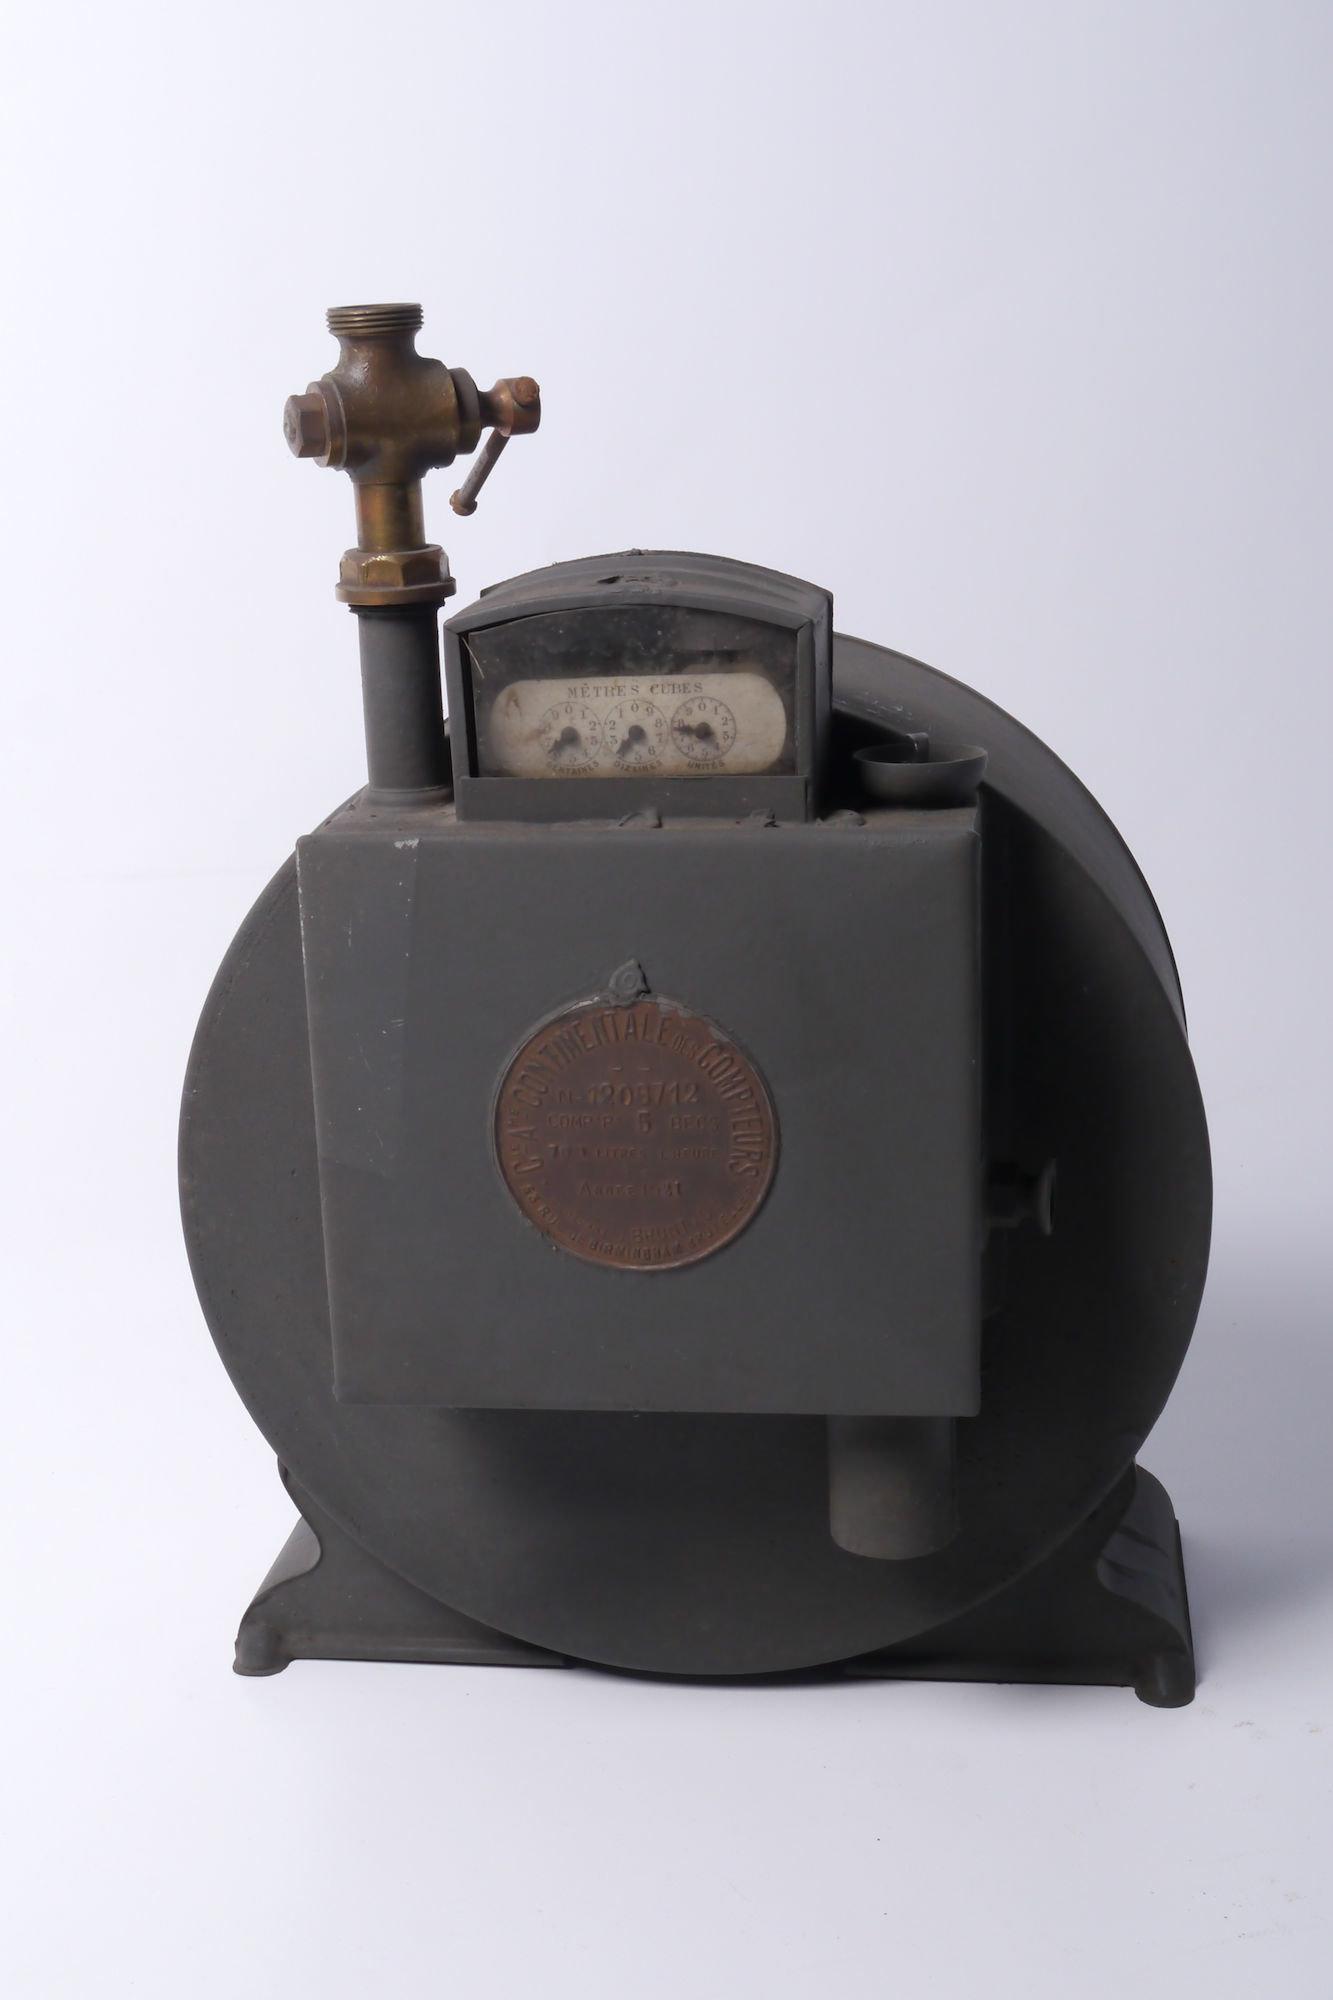 Verbruiksmeter voor gas van het merk Compagnie Continentale des Compteurs